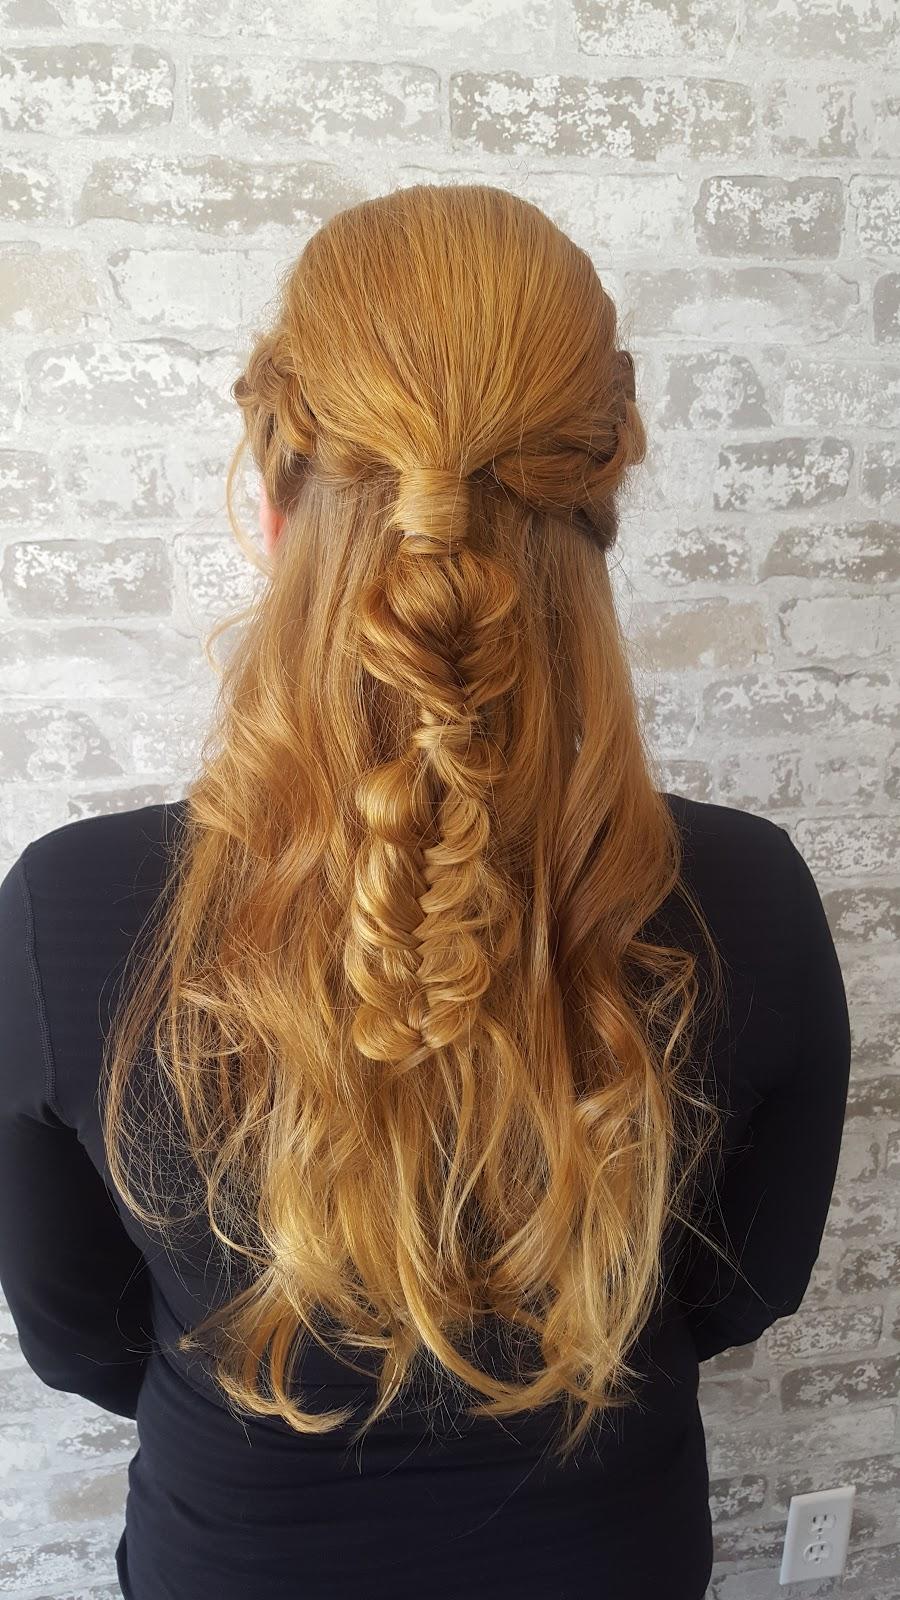 one 17 hair studios - hair care    Photo 5 of 10   Address: 7315 W Warm Springs Rd, Las Vegas, NV 89113, USA   Phone: (702) 496-5778